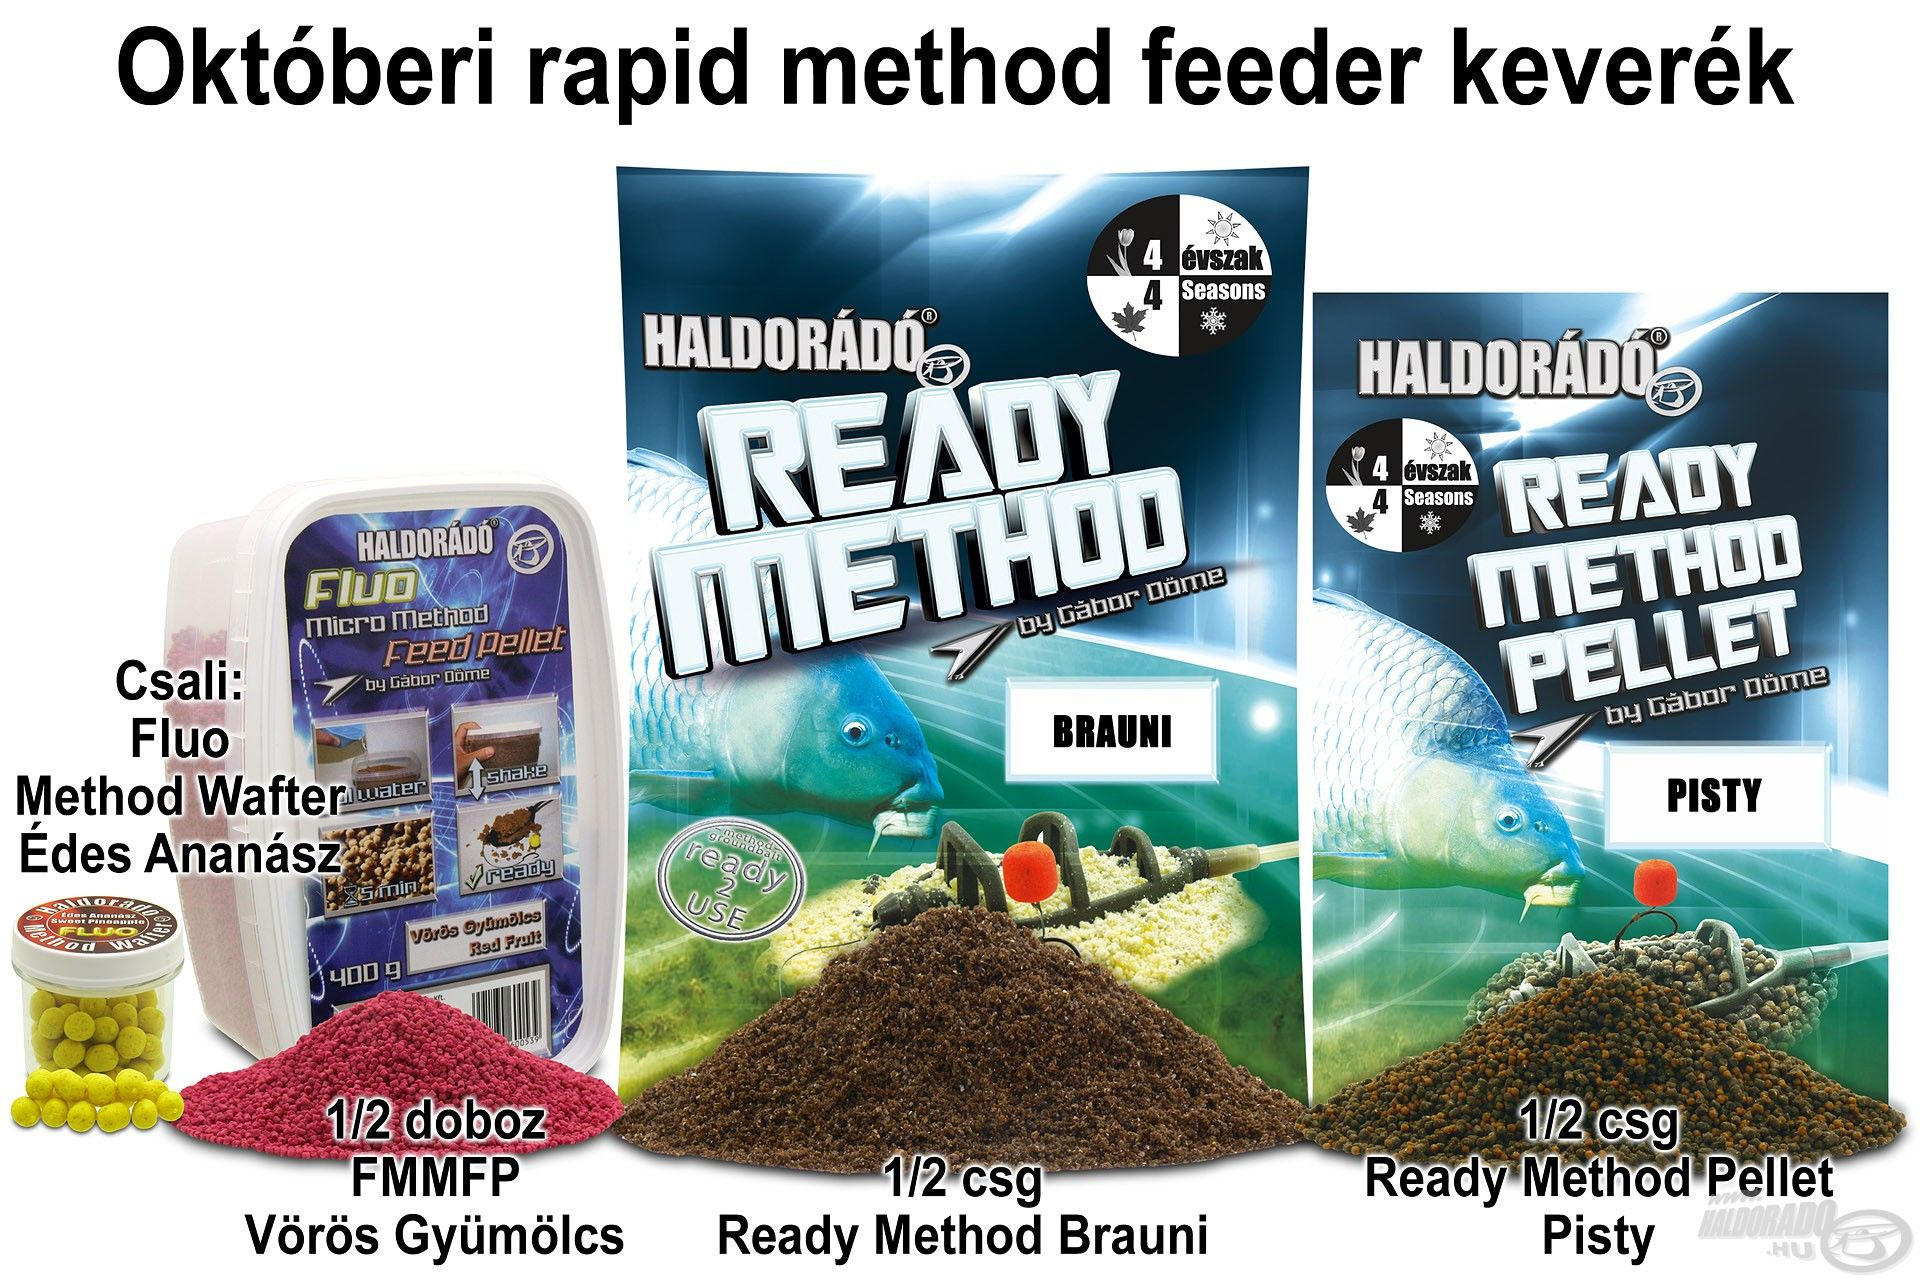 Októberi rapid method feeder keverék